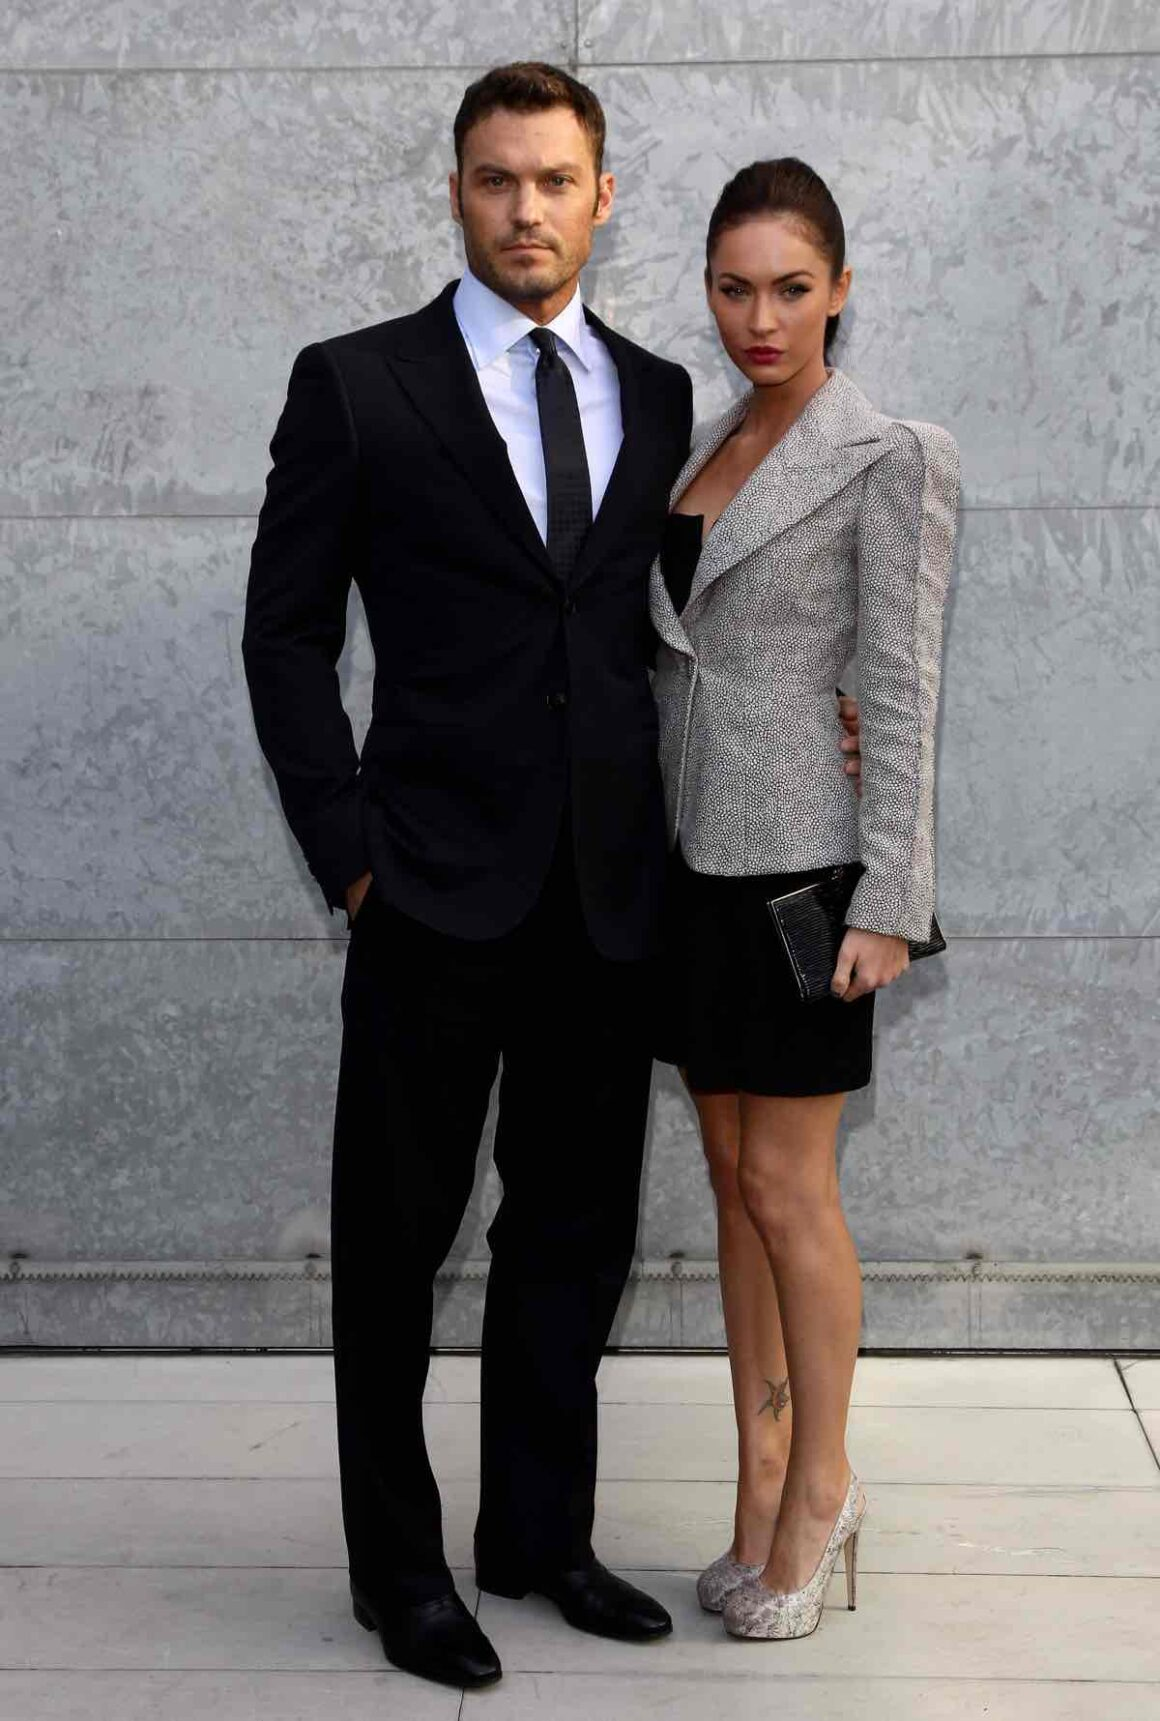 Megan Fox And Brian Austin Green Giorgio Armani - Front Row: Milan Fashion Week Womenswear S/S 2011